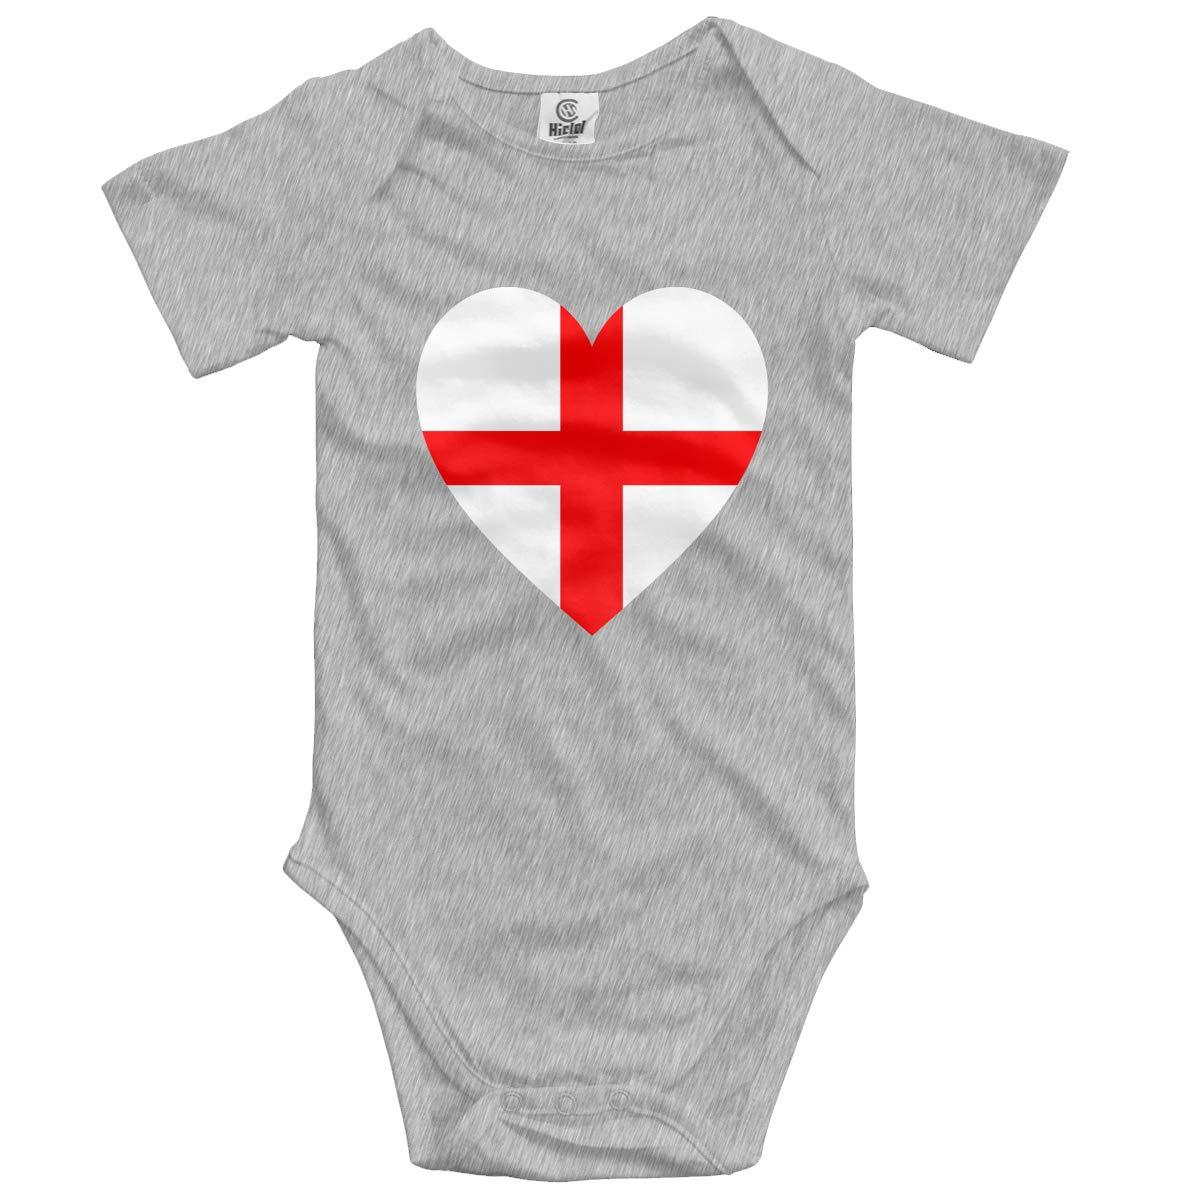 Baby Short-Sleeve Onesies Love Bodysuit Baby Outfits